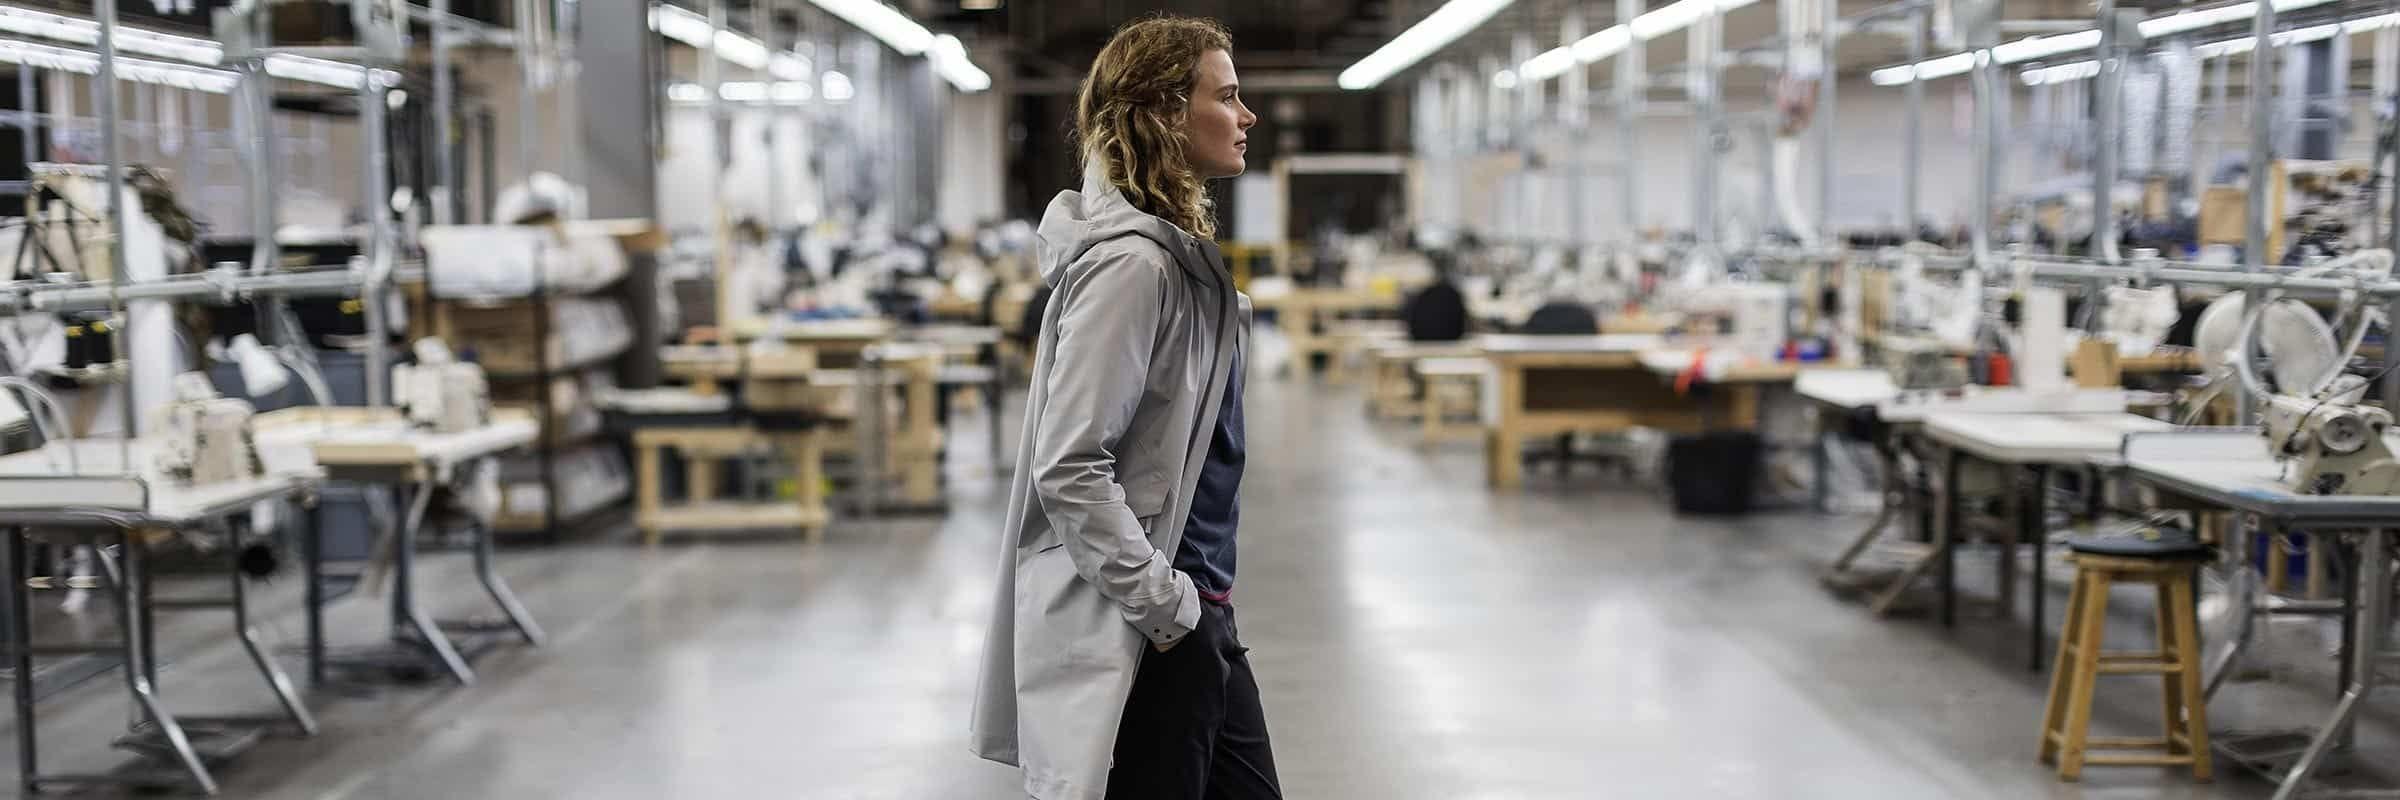 Top 5 Urban Raincoats for Women